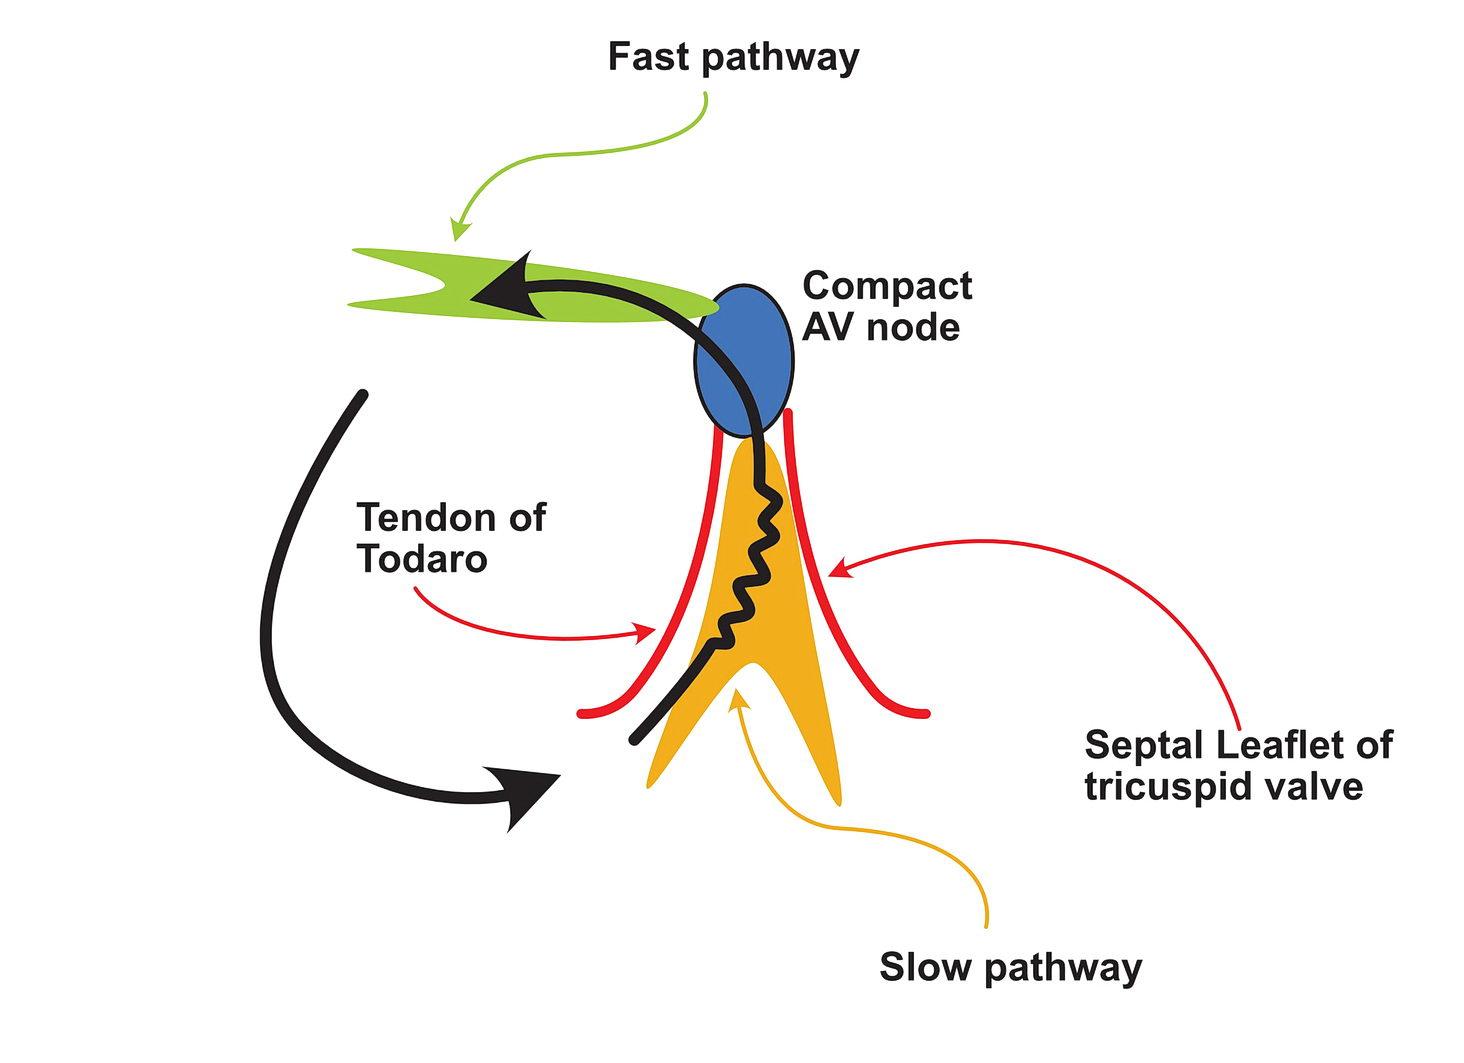 Re-entrant circuits - basic circuit of AV nodal re-entry